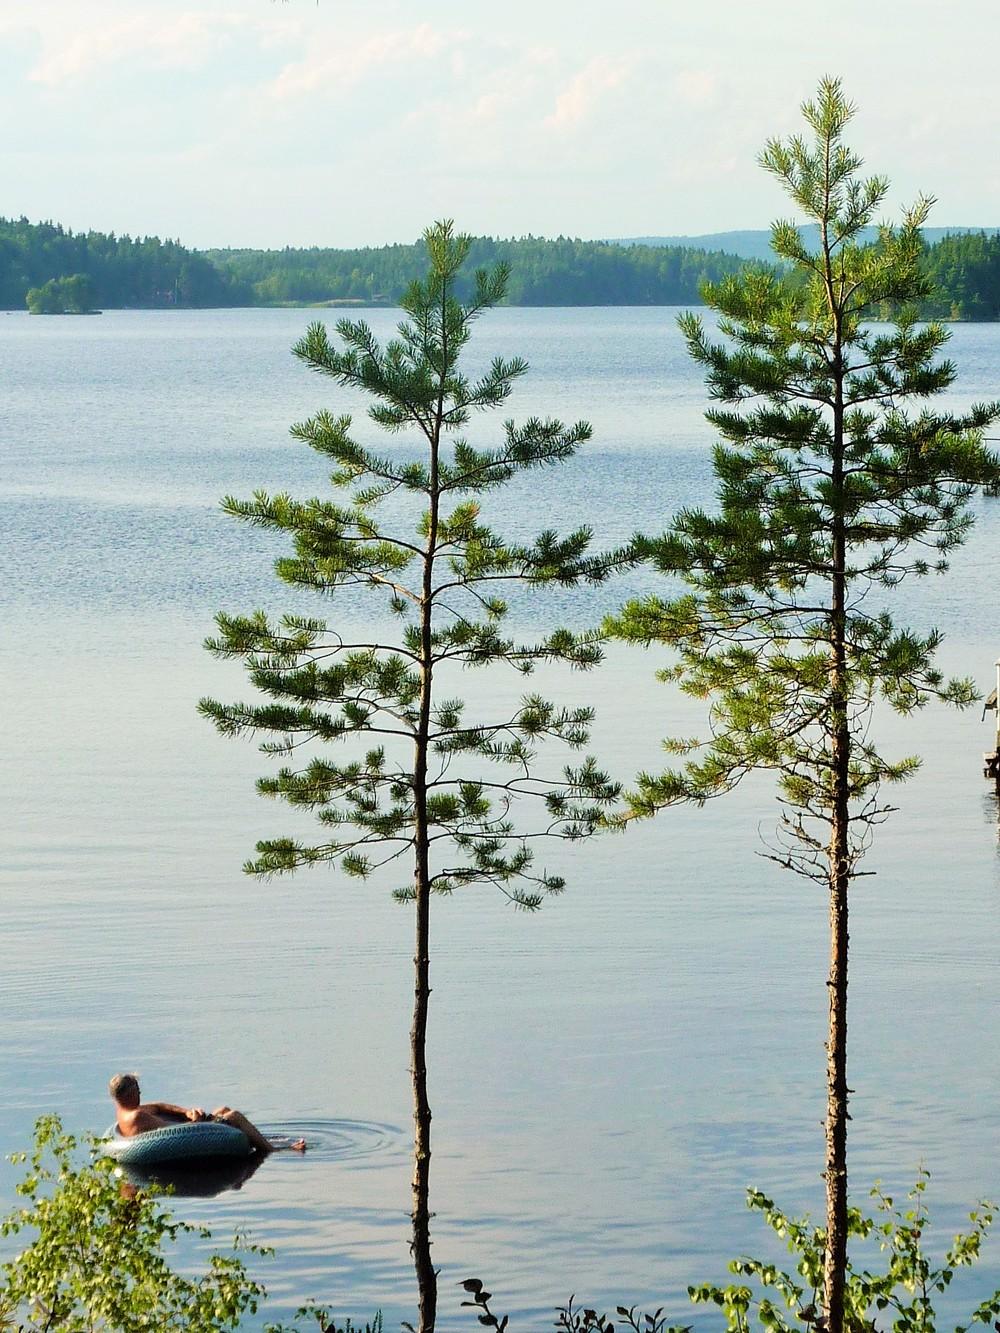 Copy of Summer at Lake Runn, Sweden